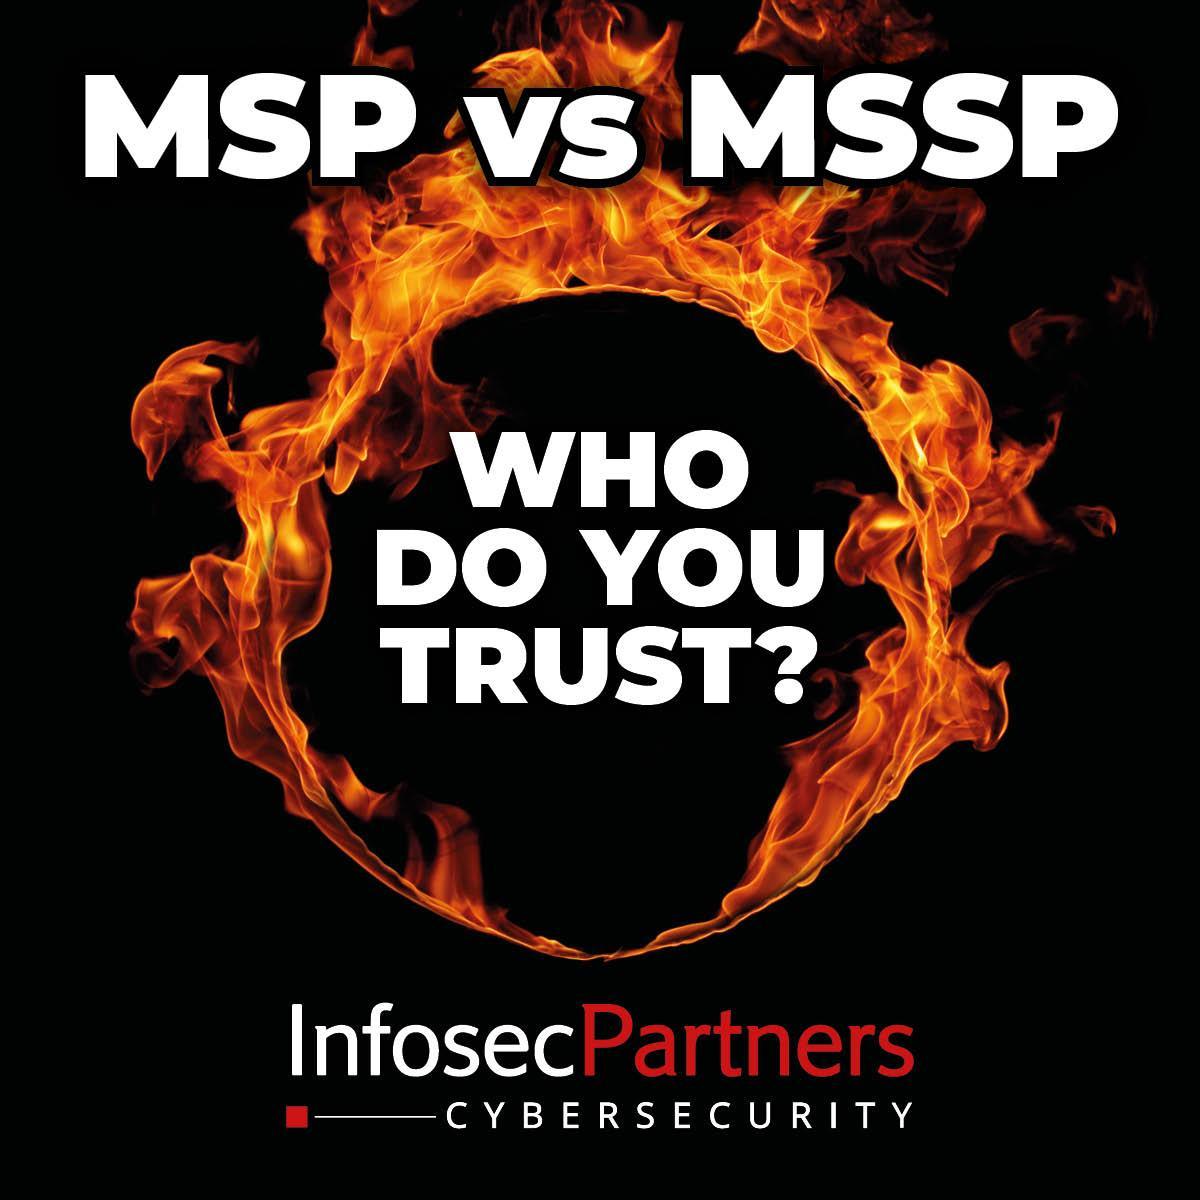 MSP VS MSSP - Who do you trust?